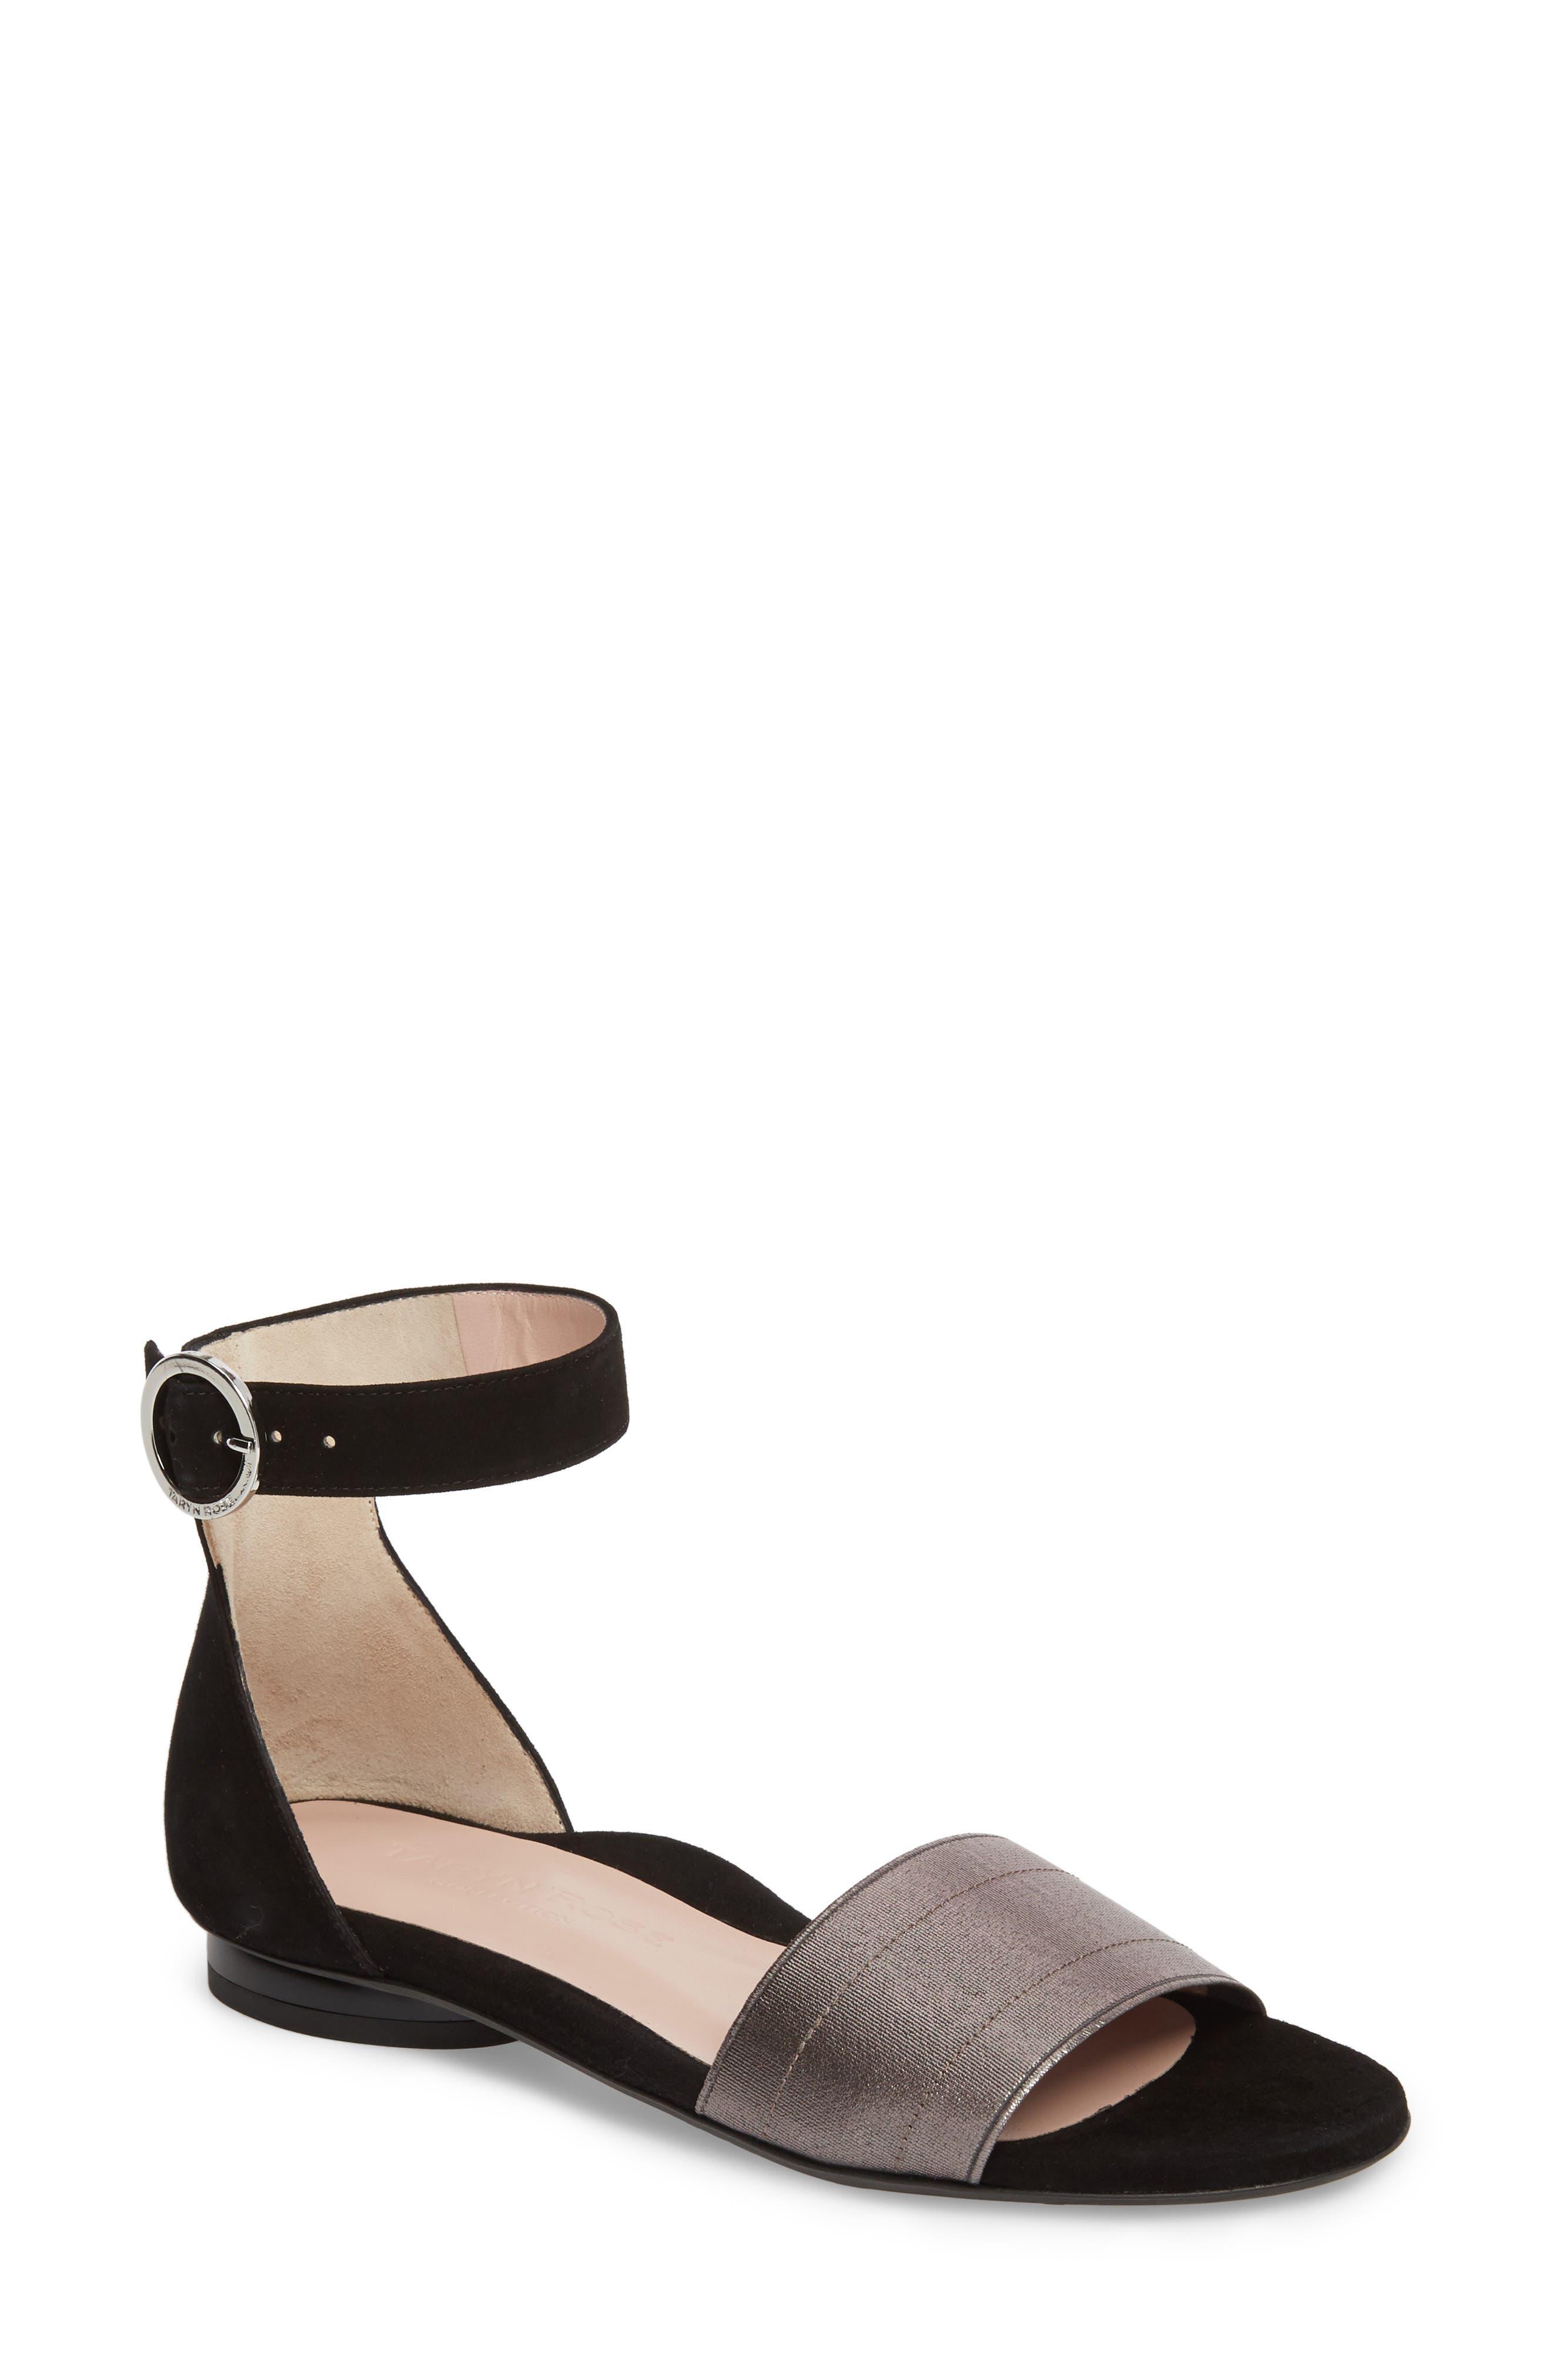 Donati Ankle Strap Sandal,                             Main thumbnail 1, color,                             Black/ Gunmetal Suede